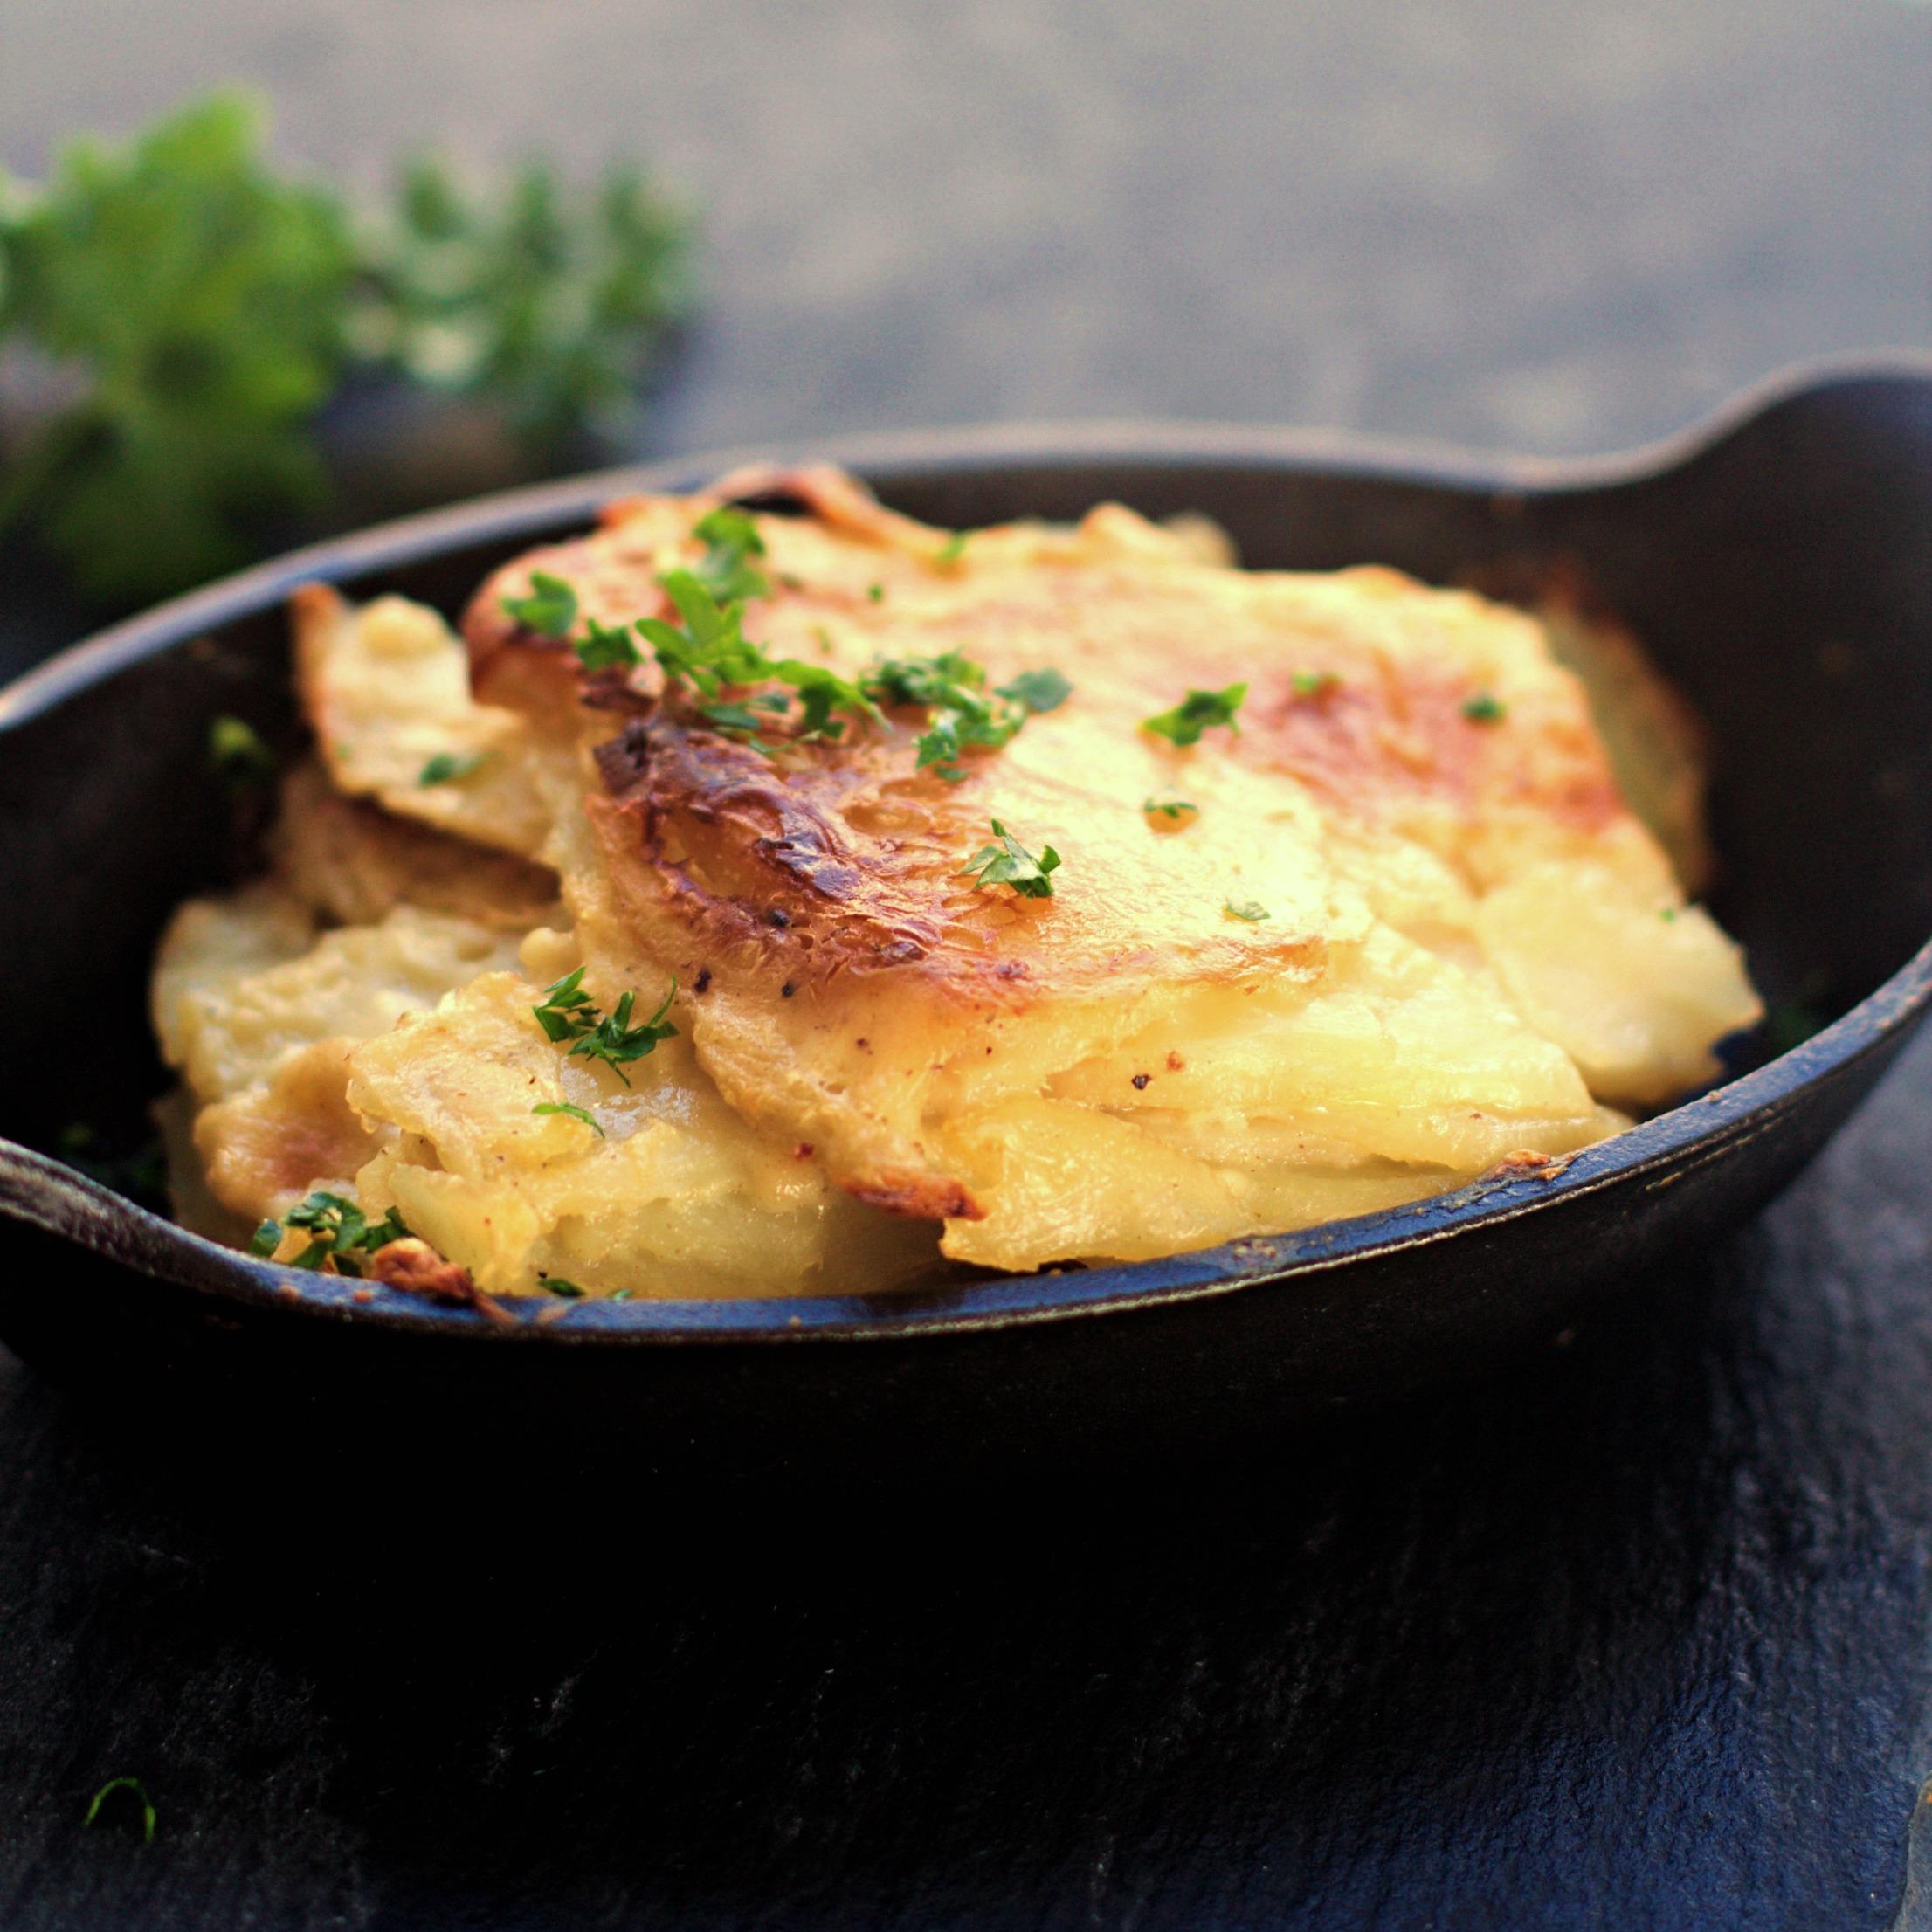 scalloped potatoes perfect side for tenderloin roast